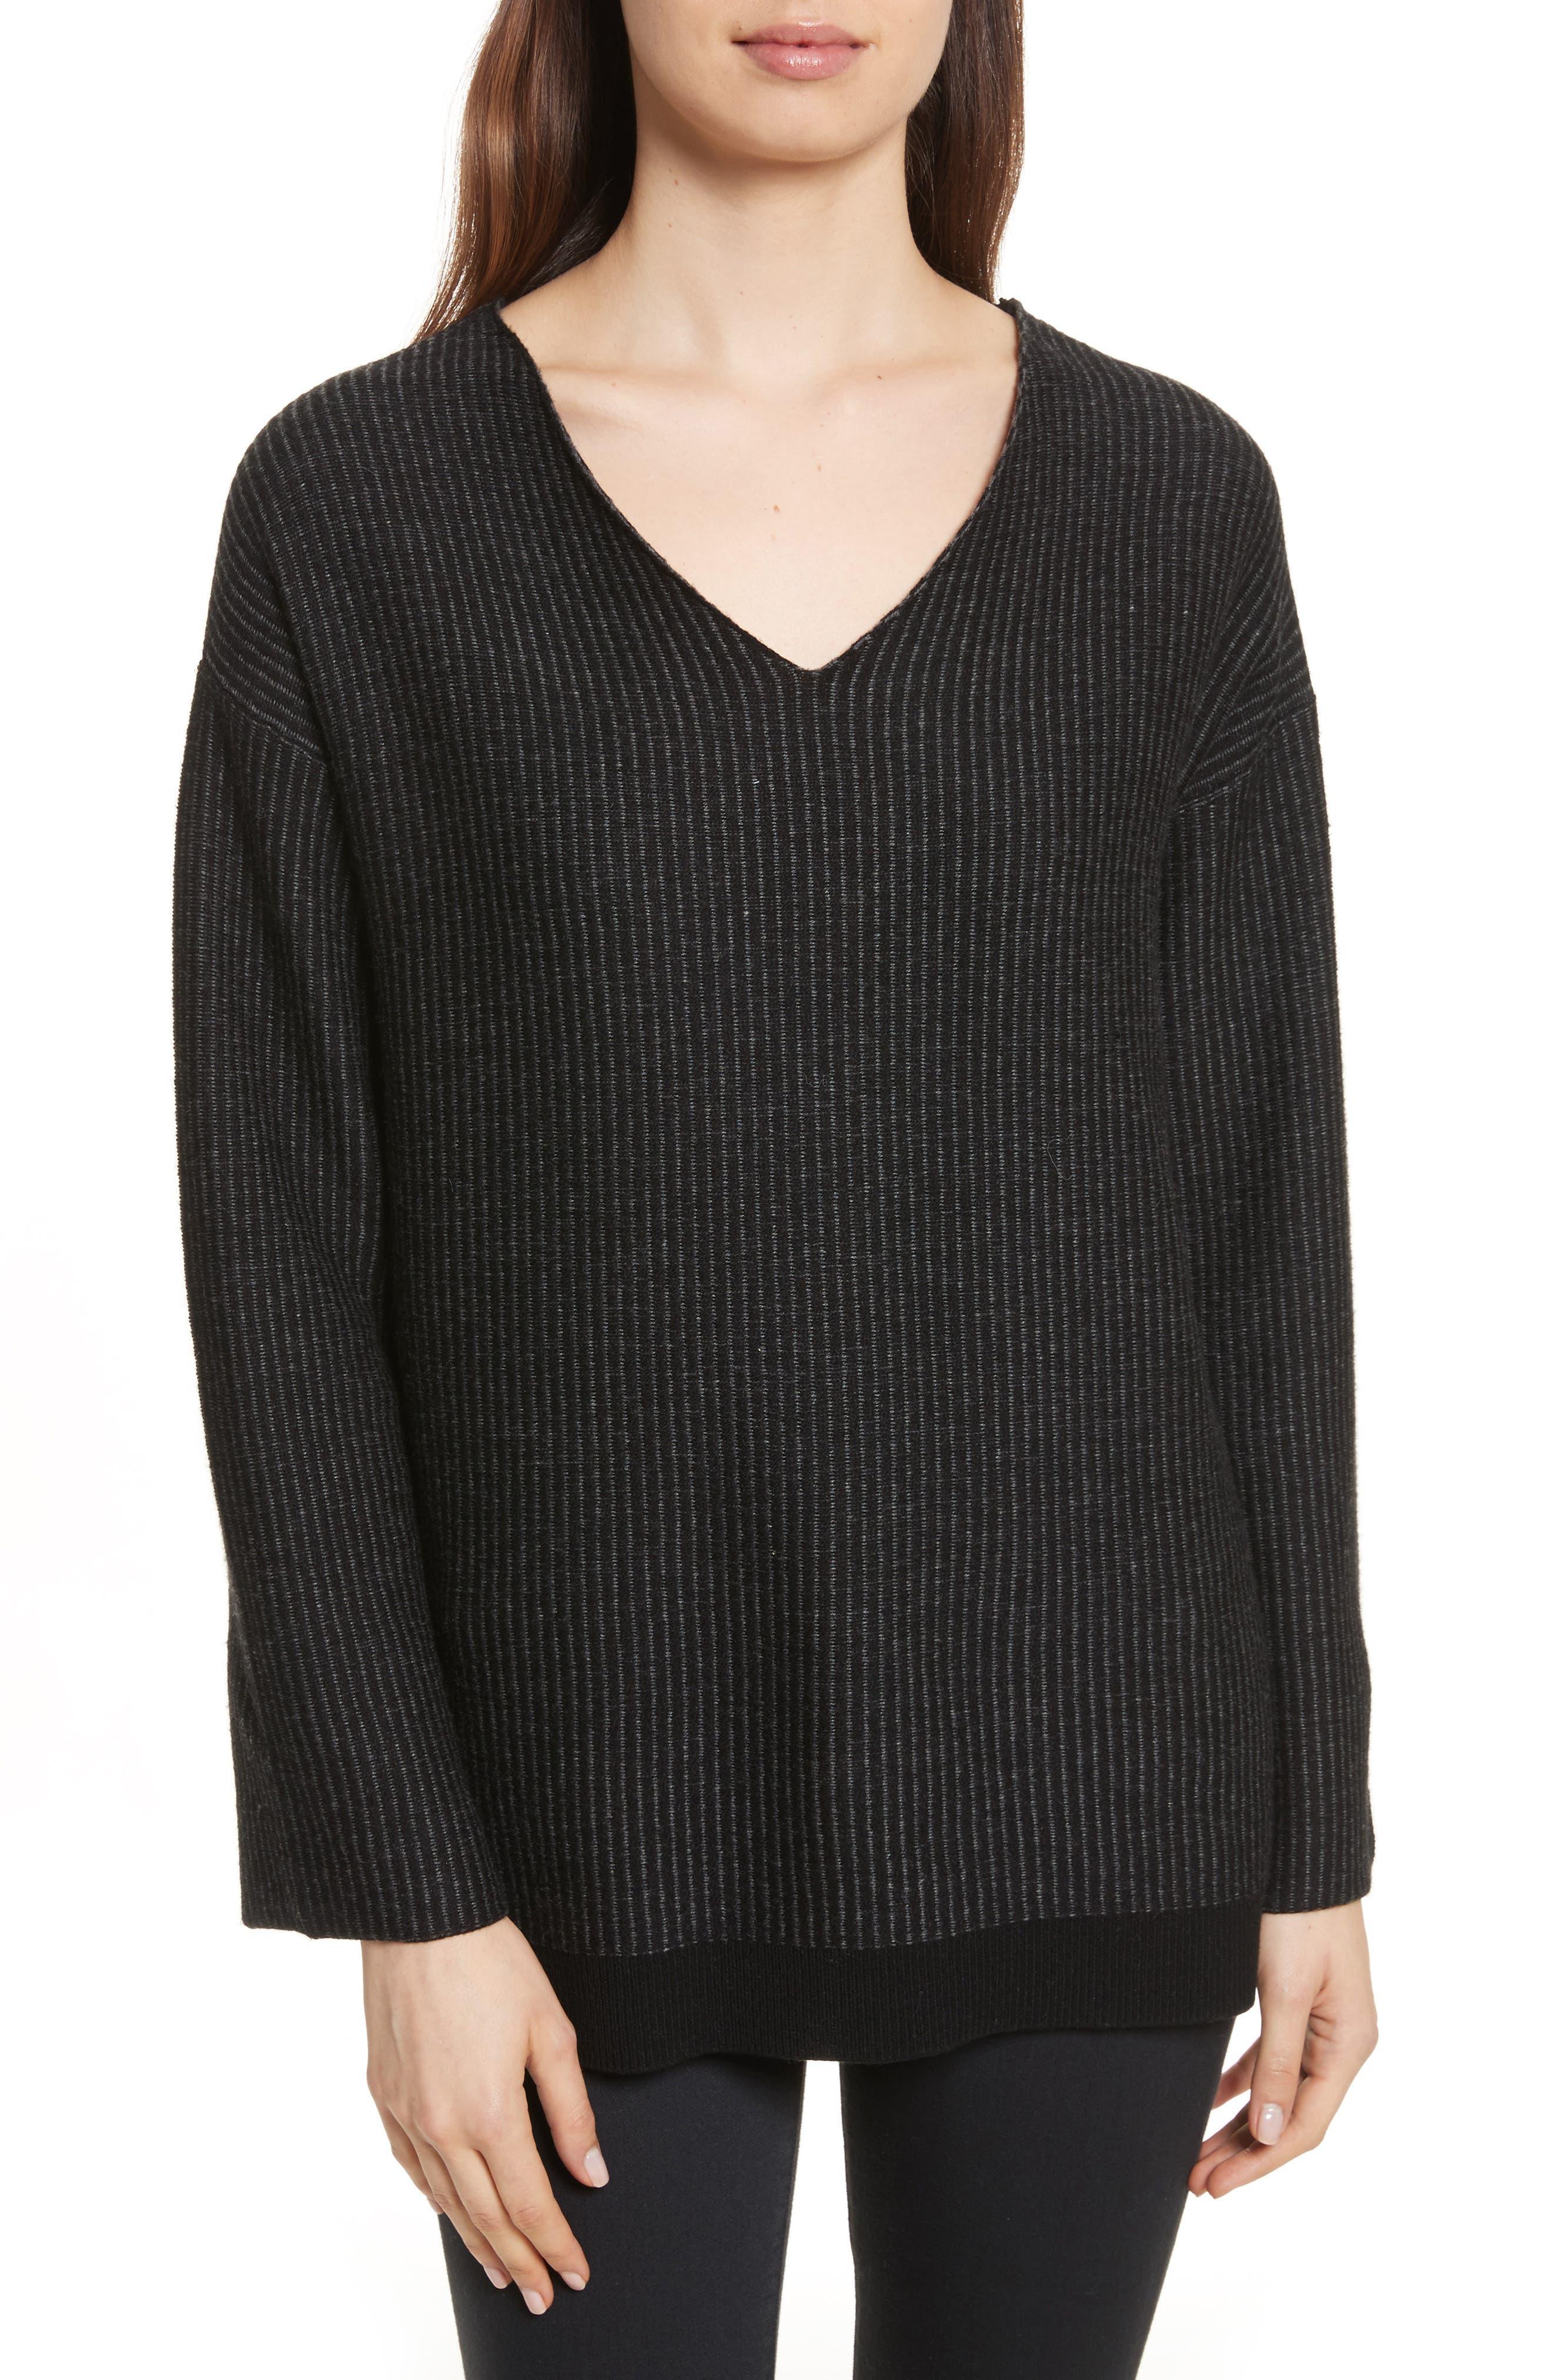 Main Image - ATM Anthony Thomas Melillo Cotton Blend Sweater